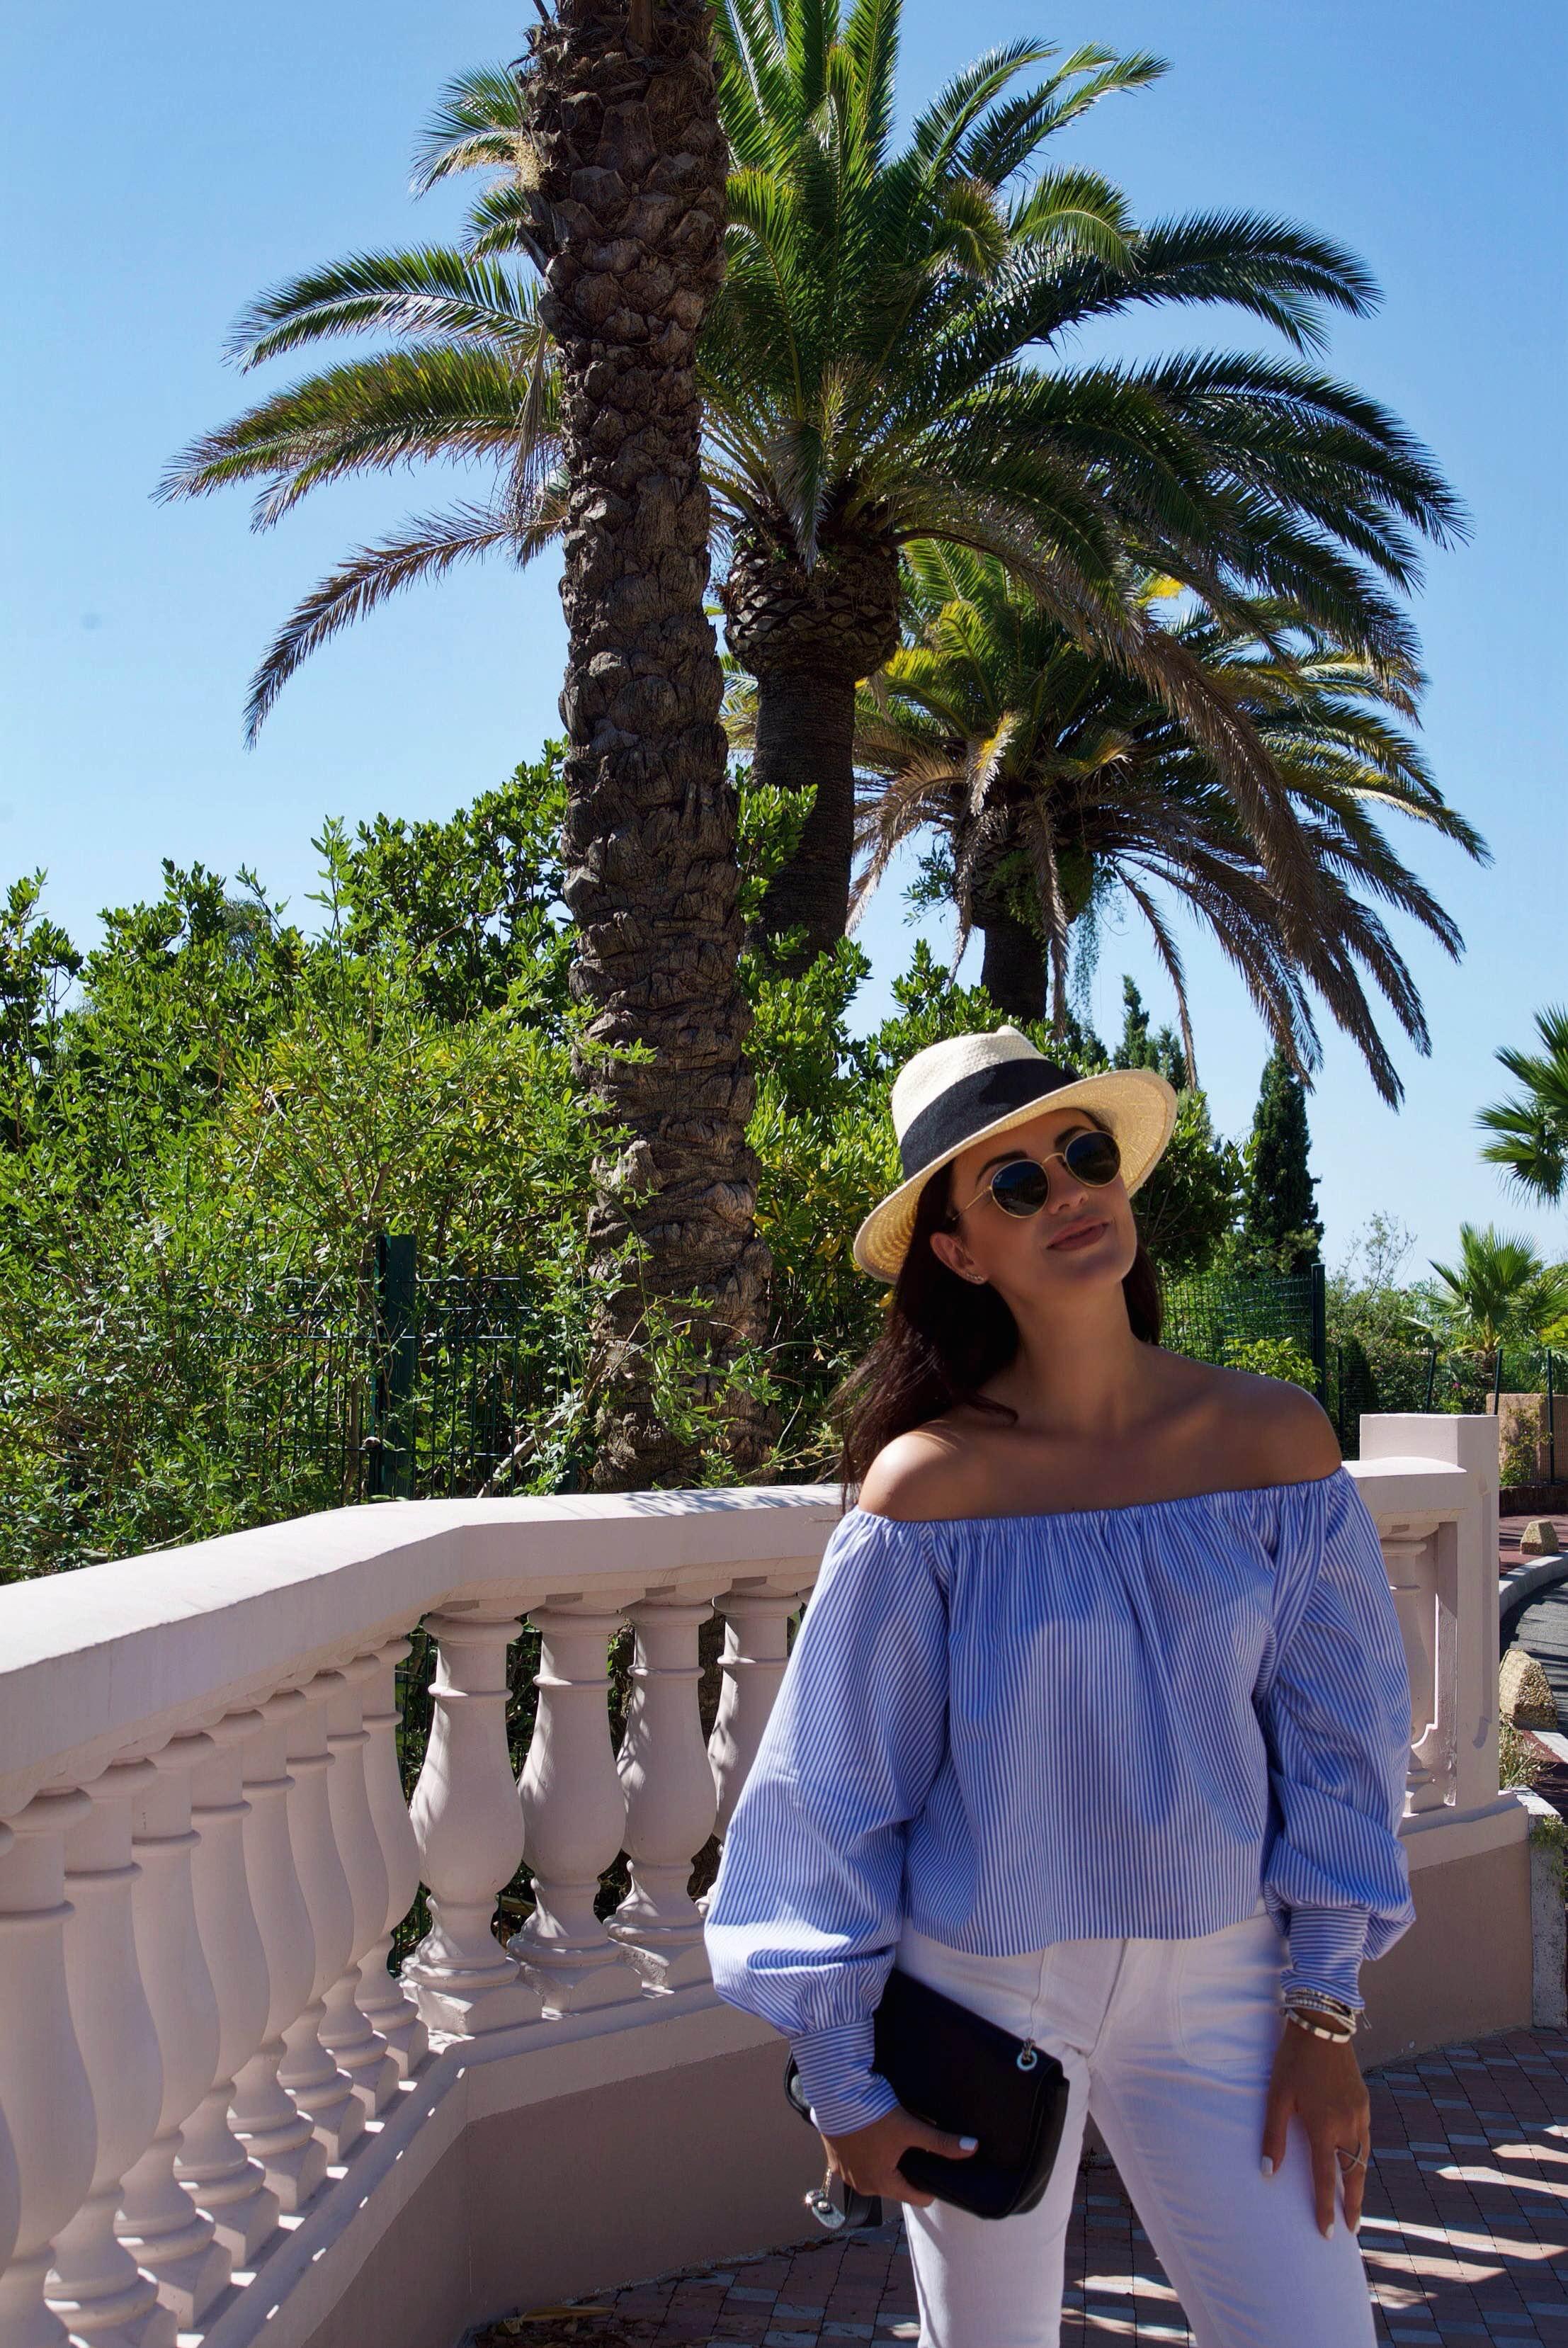 05-Tiara-Miramar-Beach-Hotel-Spa-Cote-dAzur-Yllka-Brada-Collaboration-Disi-Couture